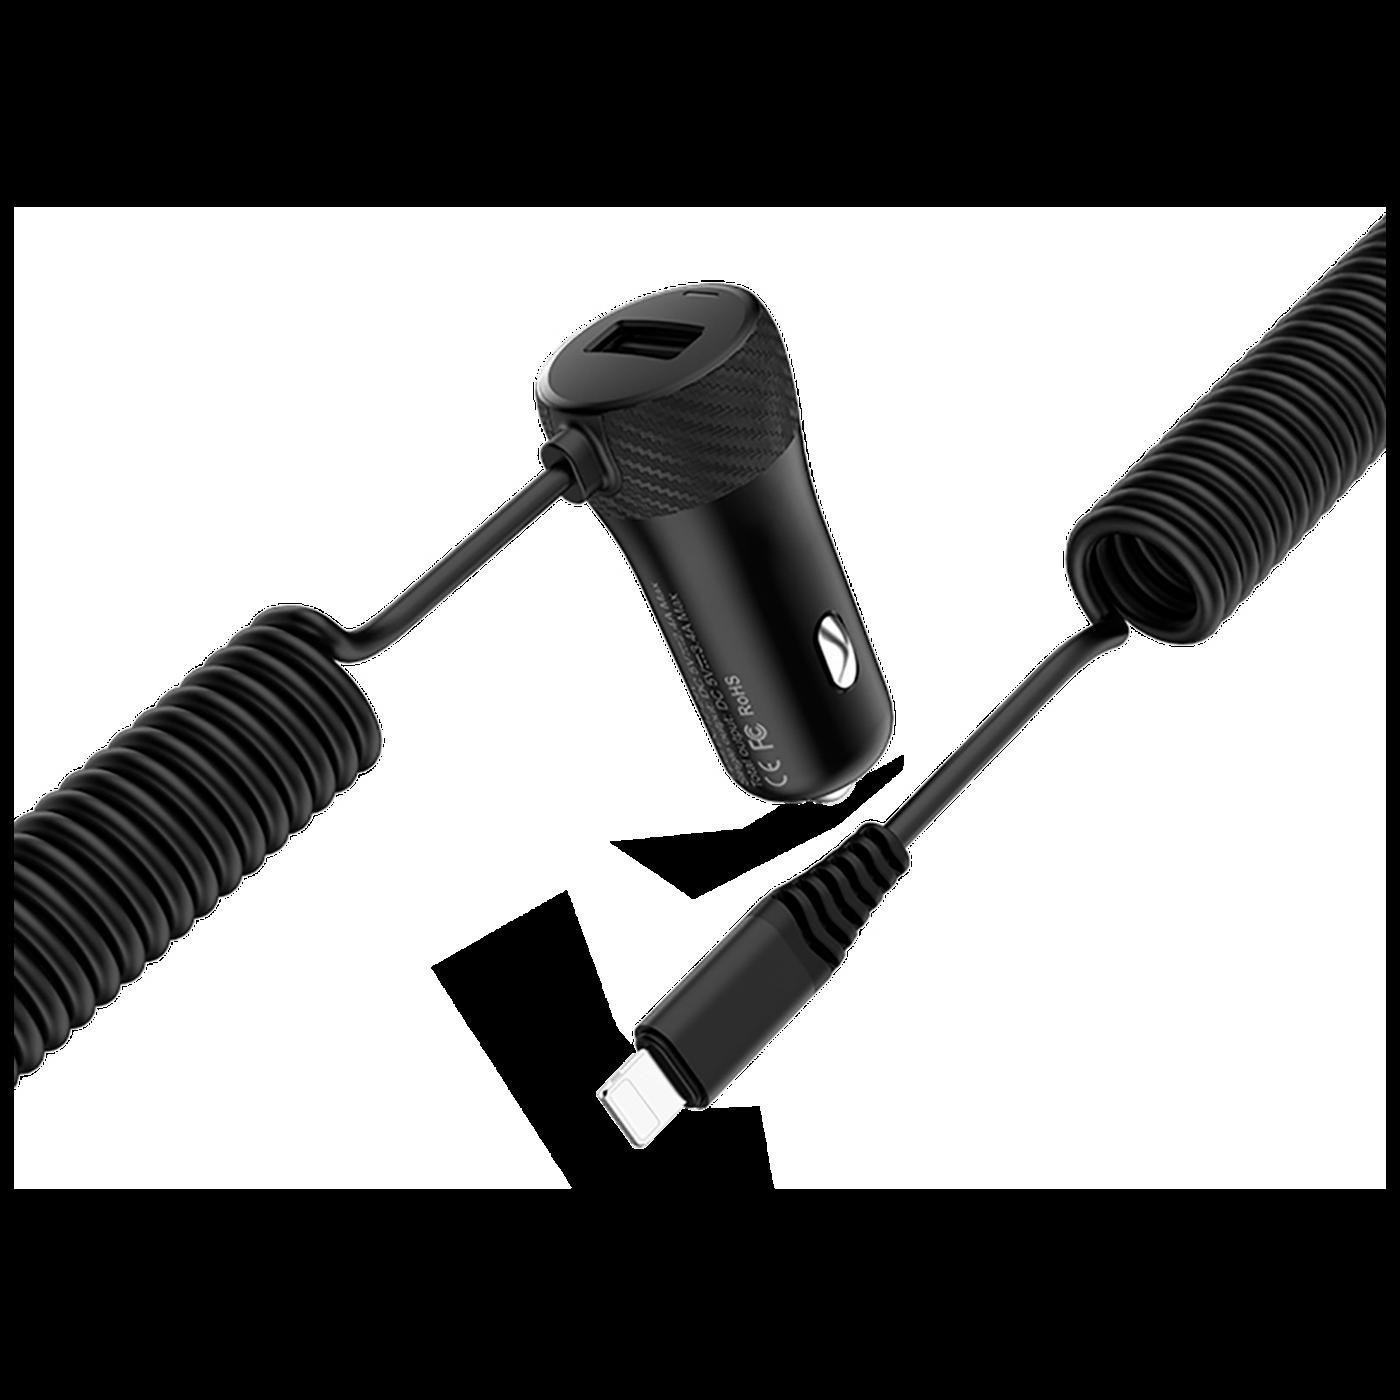 Auto punjač za Lightning kabelom,  1 x USB, 2.4 A max.